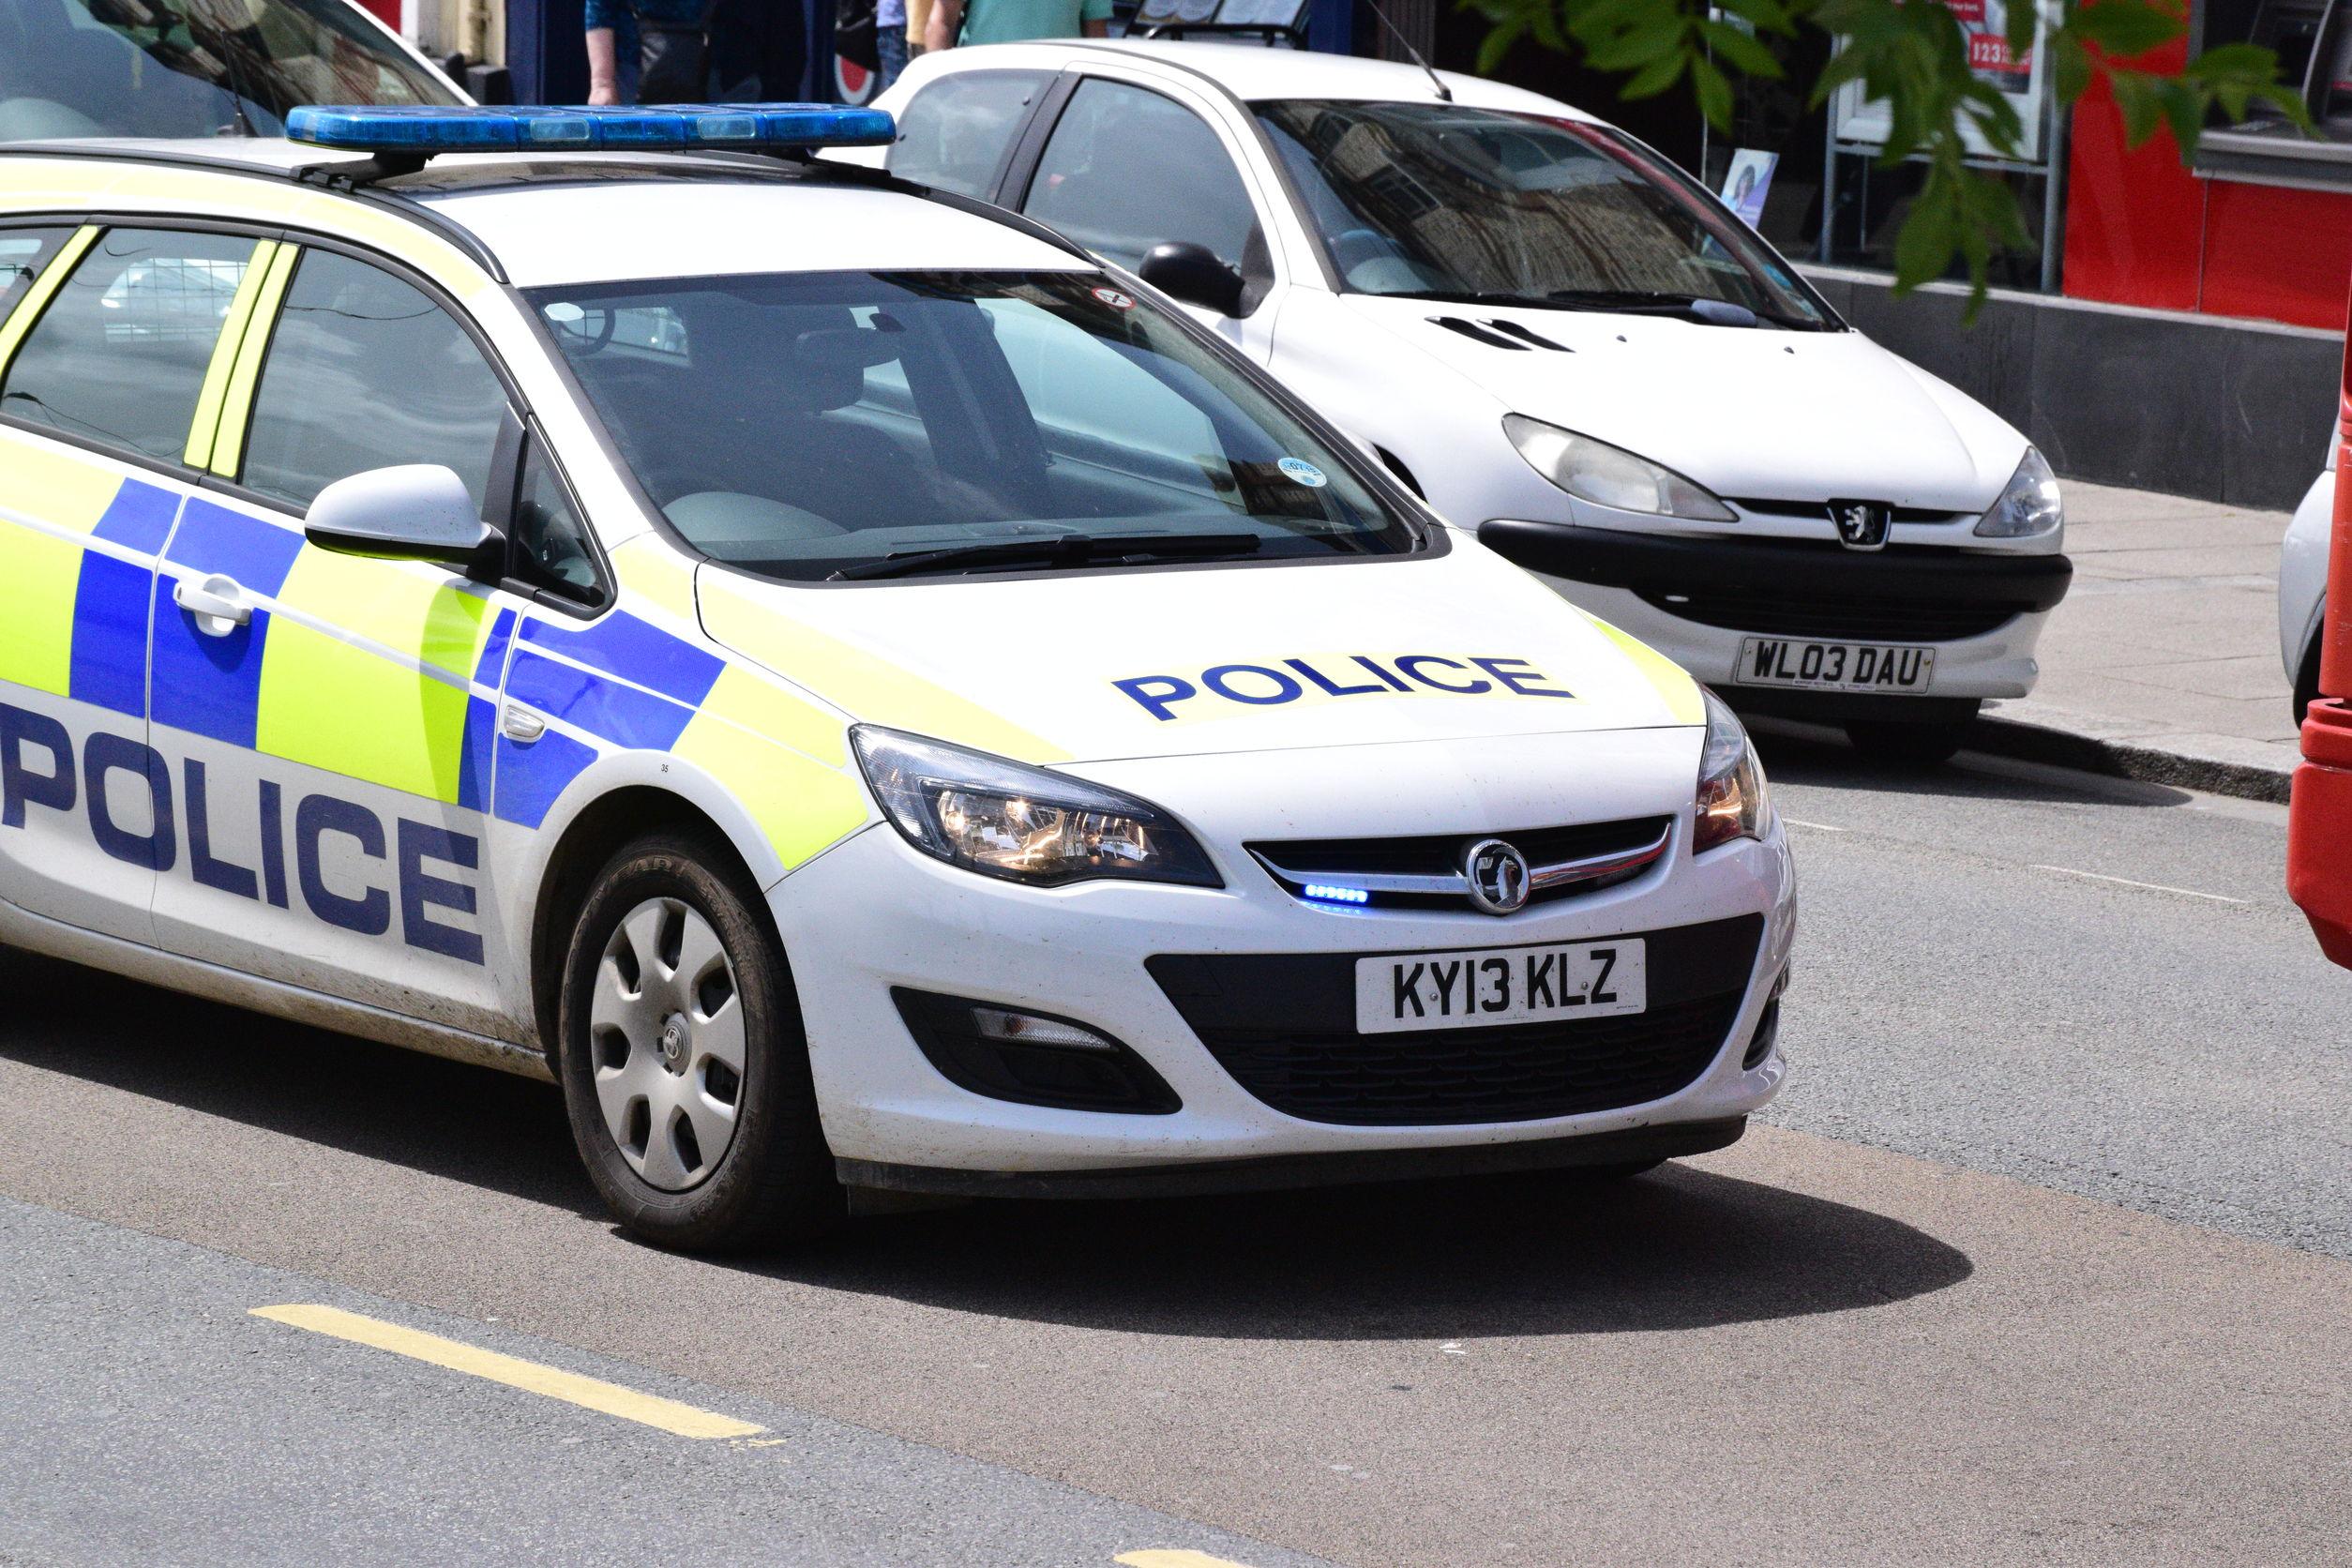 police-car-in-england.jpg